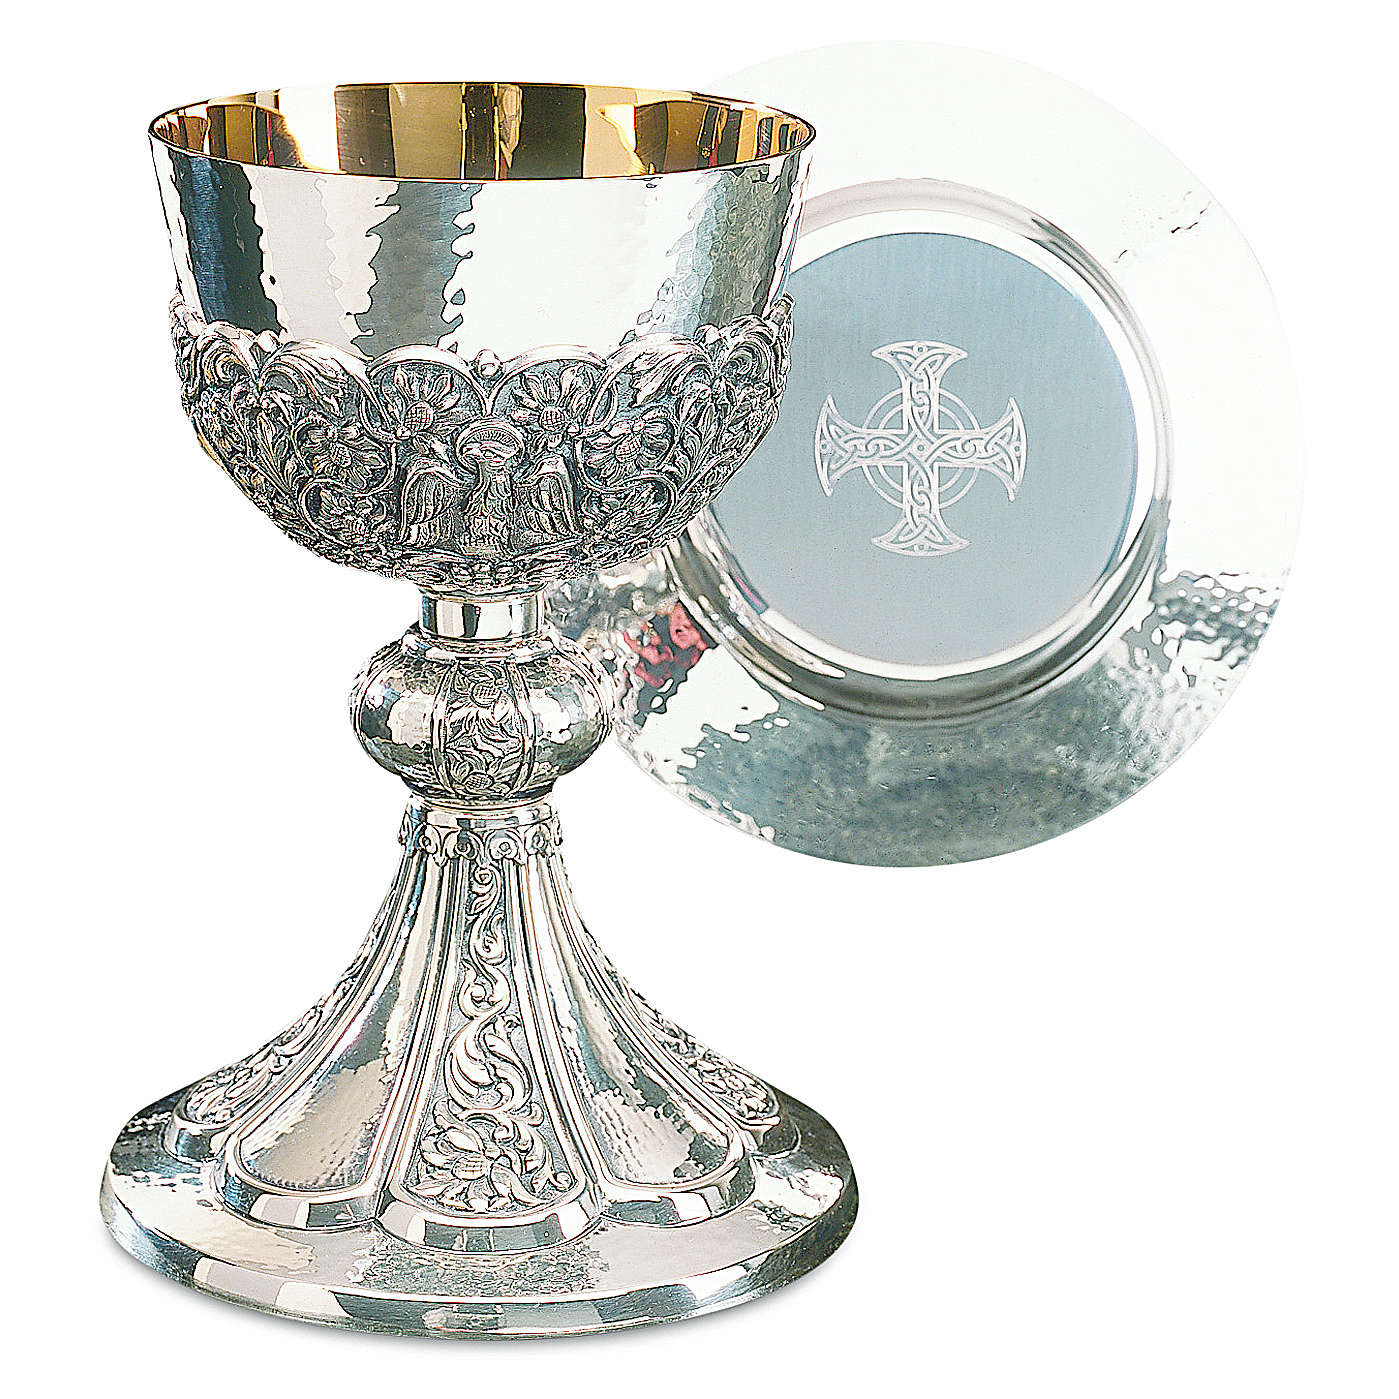 Calice patena Molina mod. Bizantino coppa argento 925 4